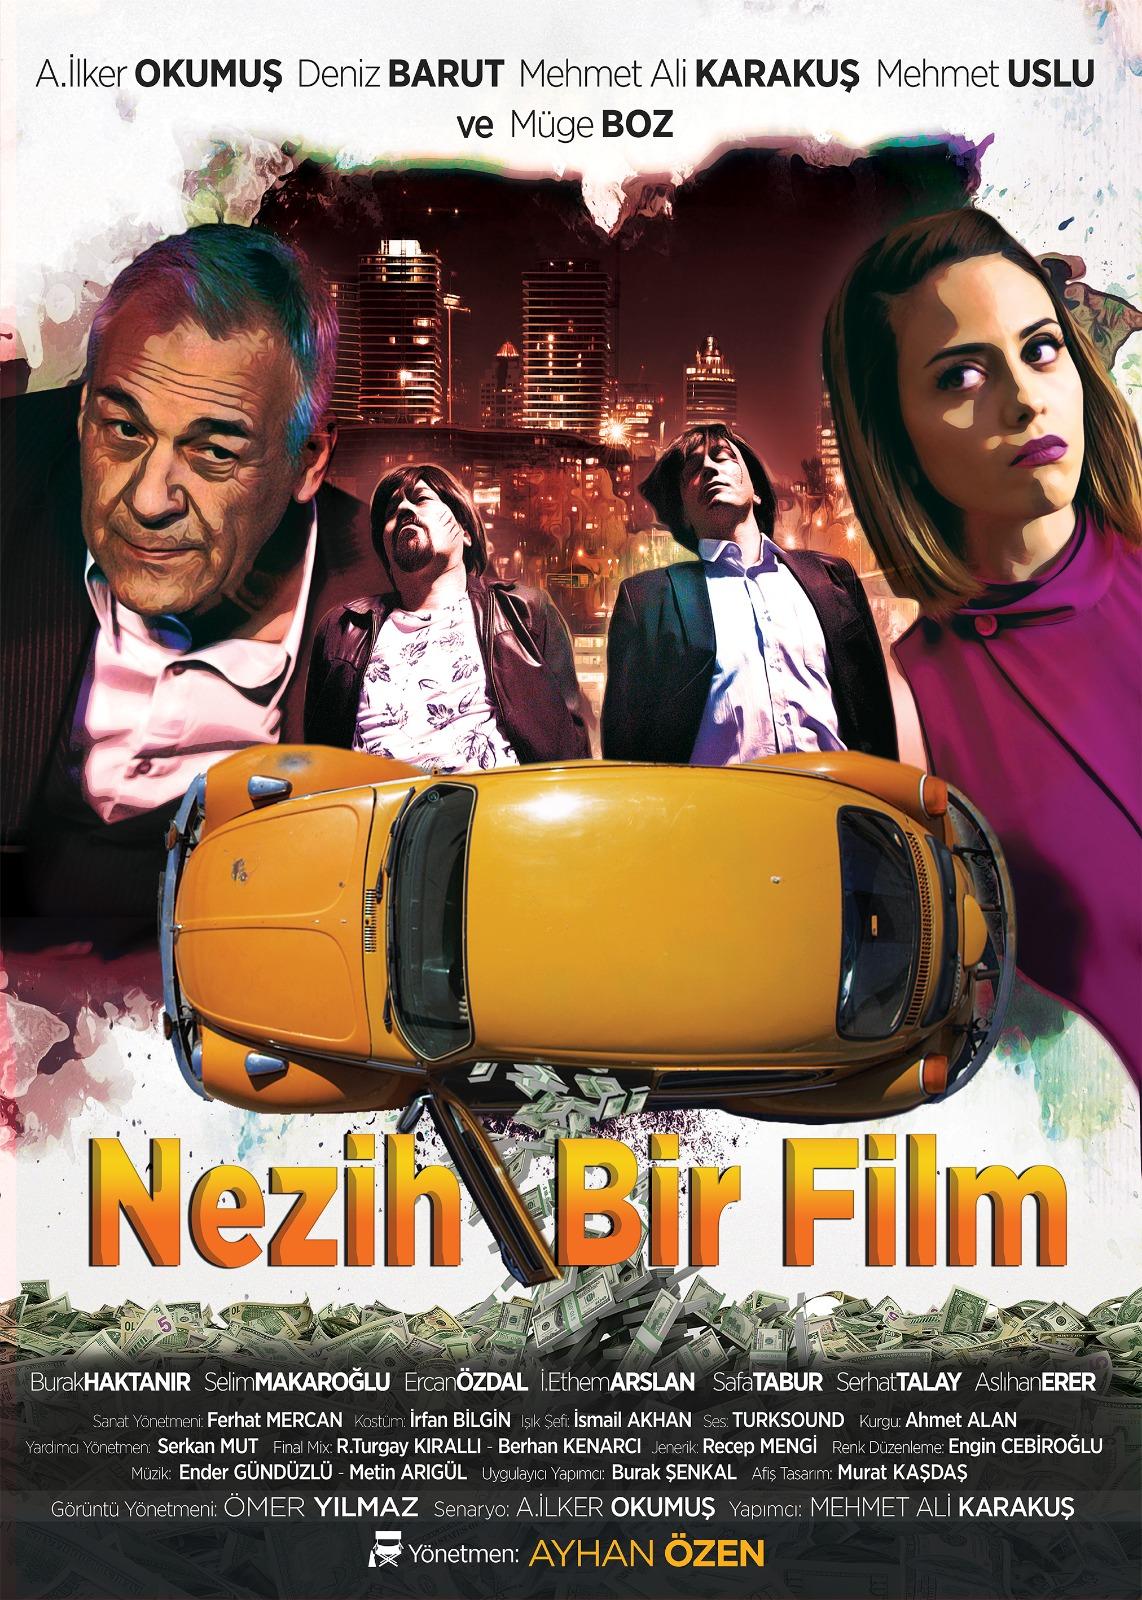 A decent Movie